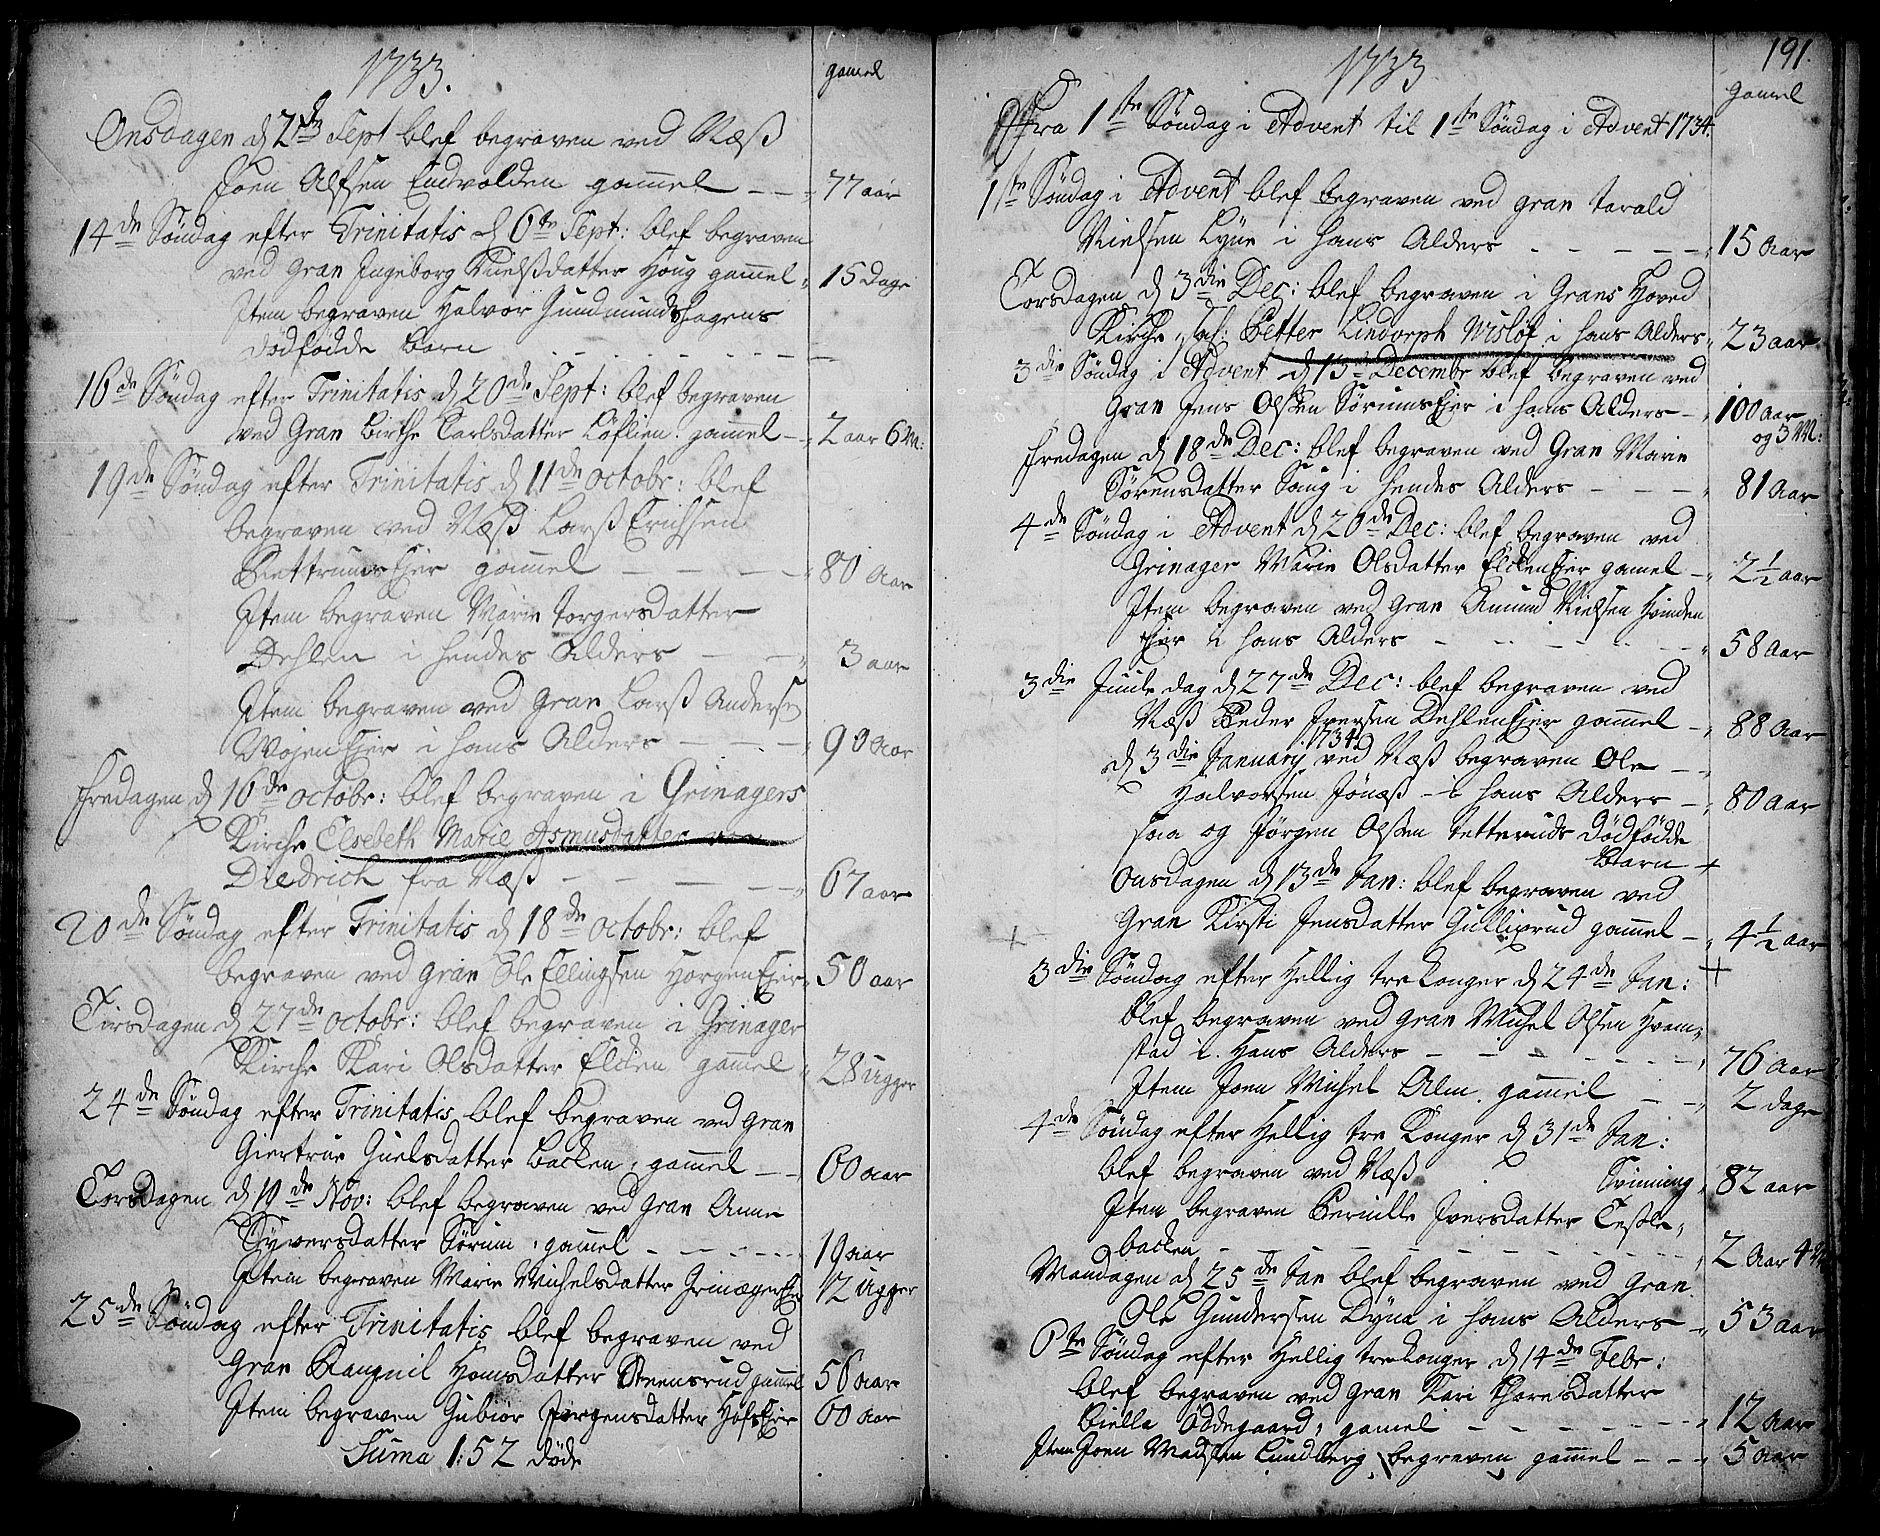 SAH, Gran prestekontor, Ministerialbok nr. 2, 1732-1744, s. 191